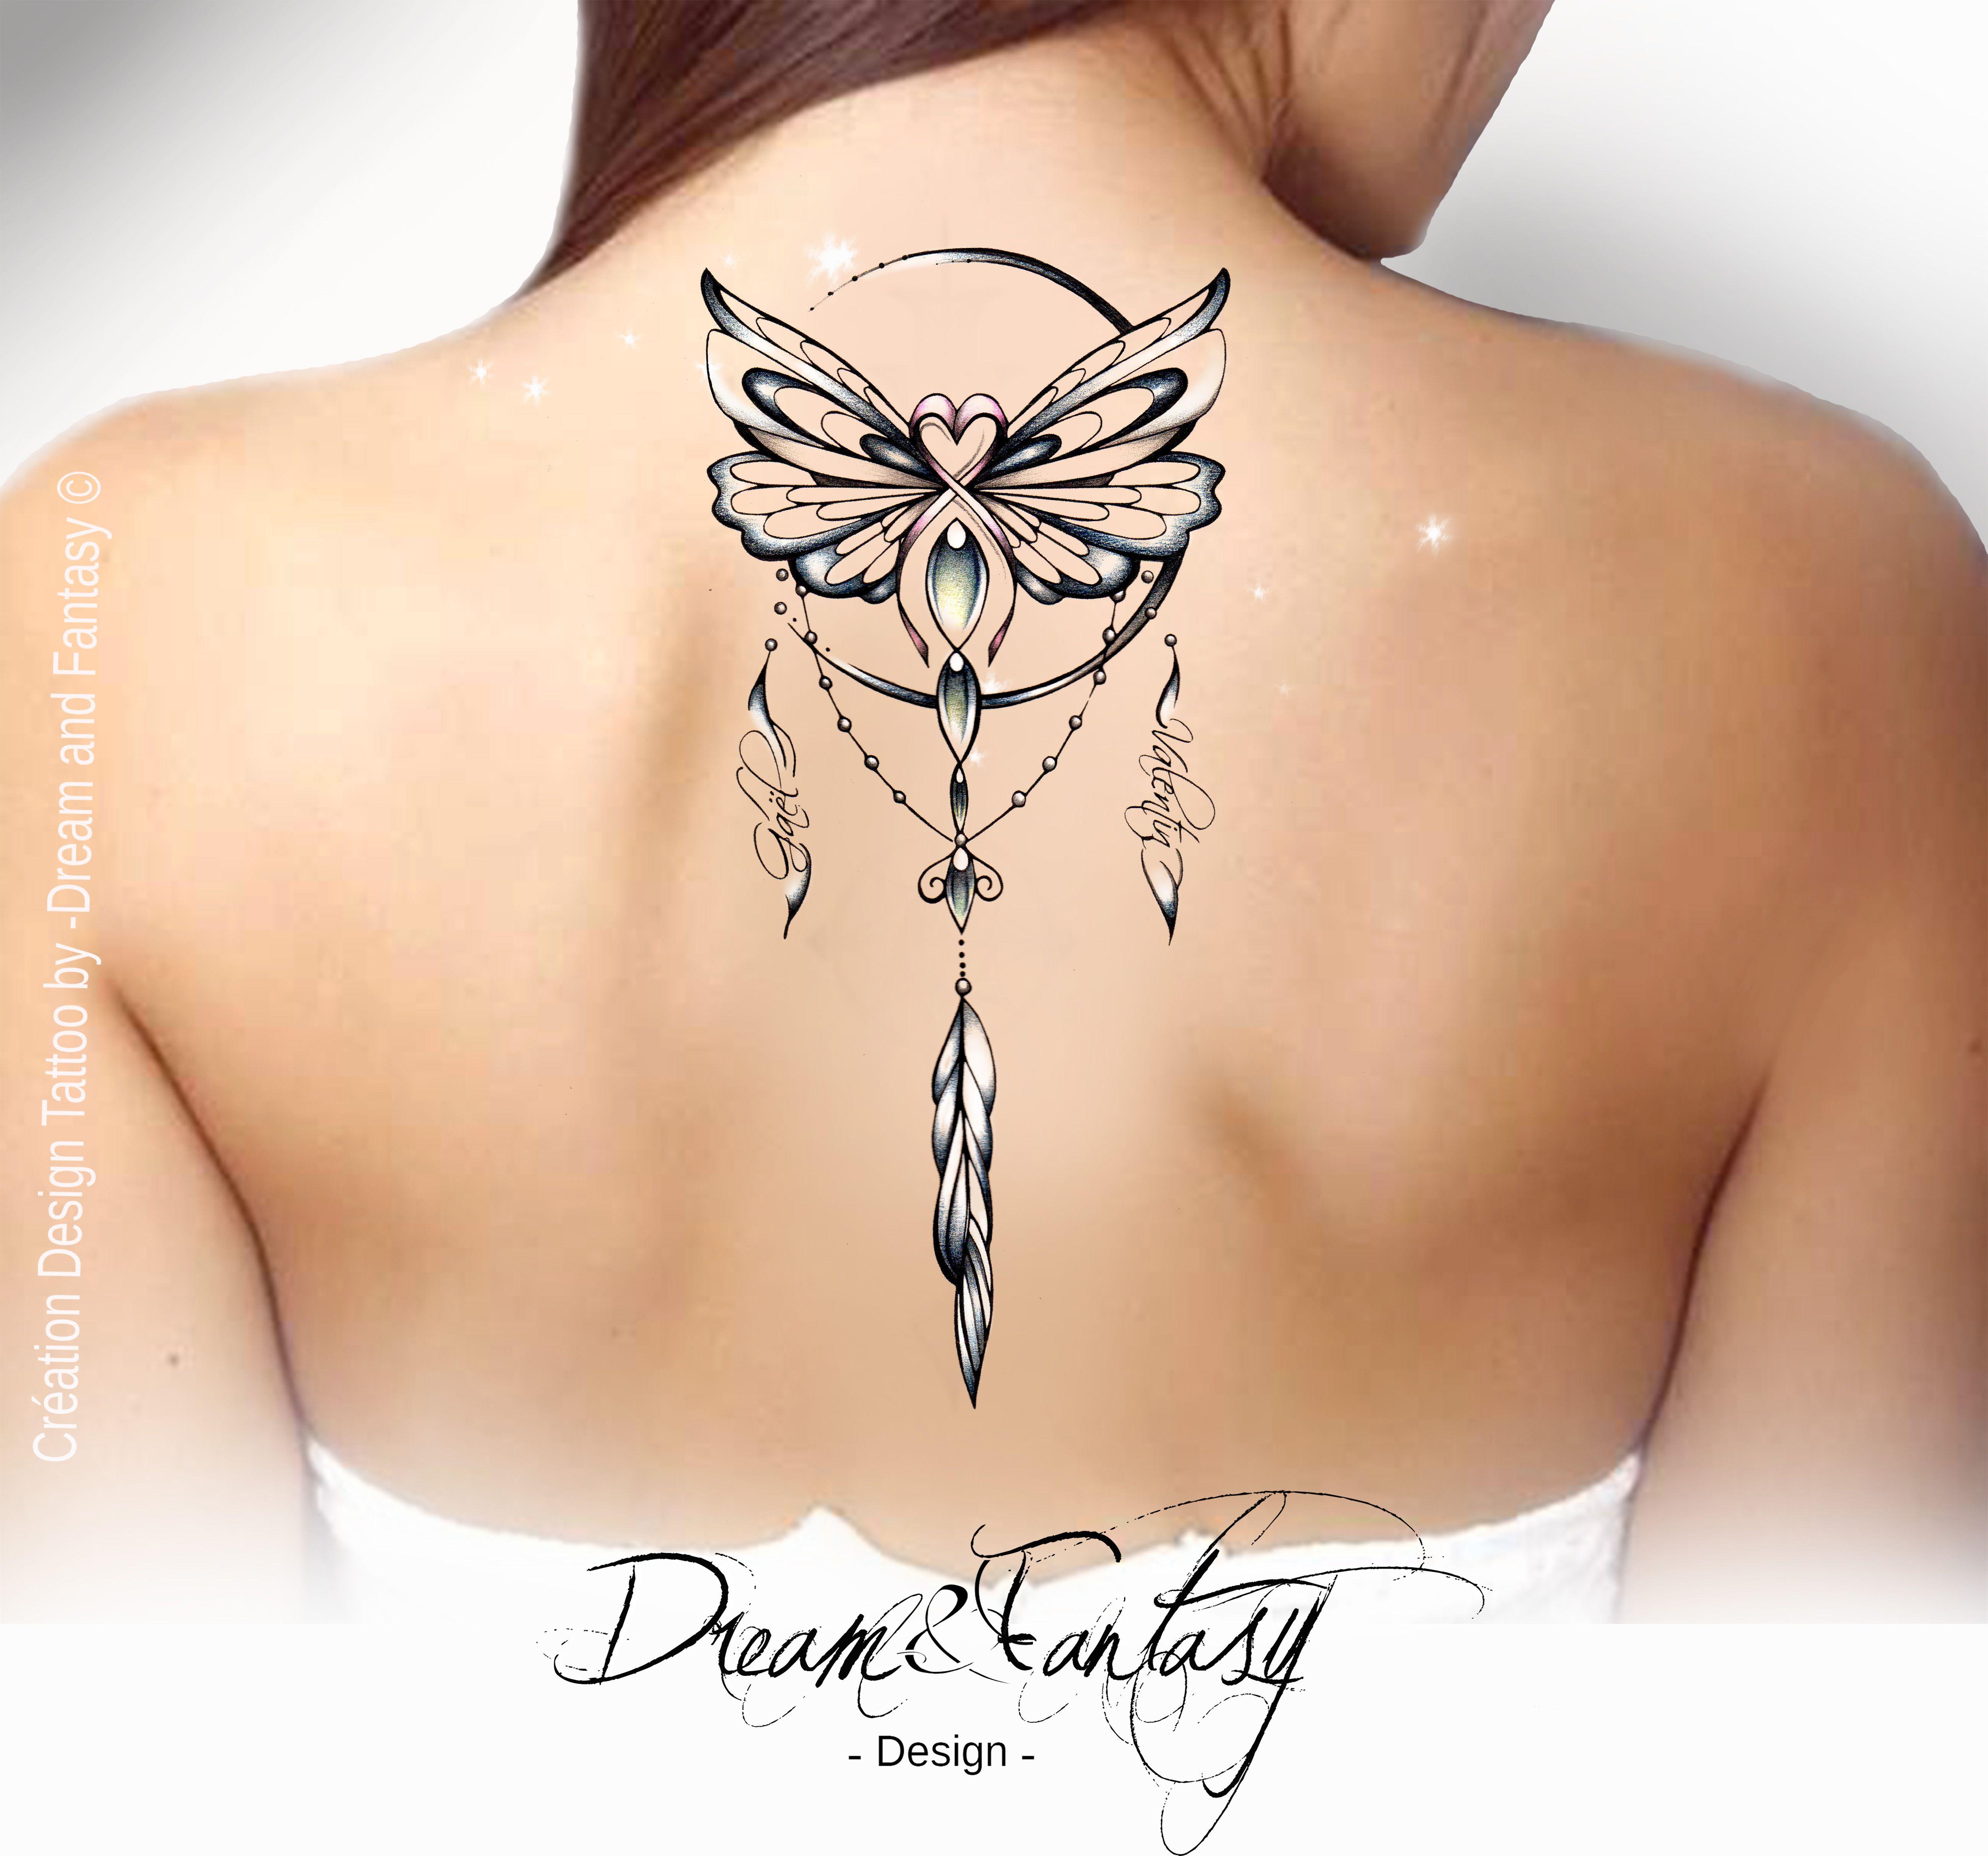 Design Tattoo Papillon Cancer Dreamcatcher Attrape Reve